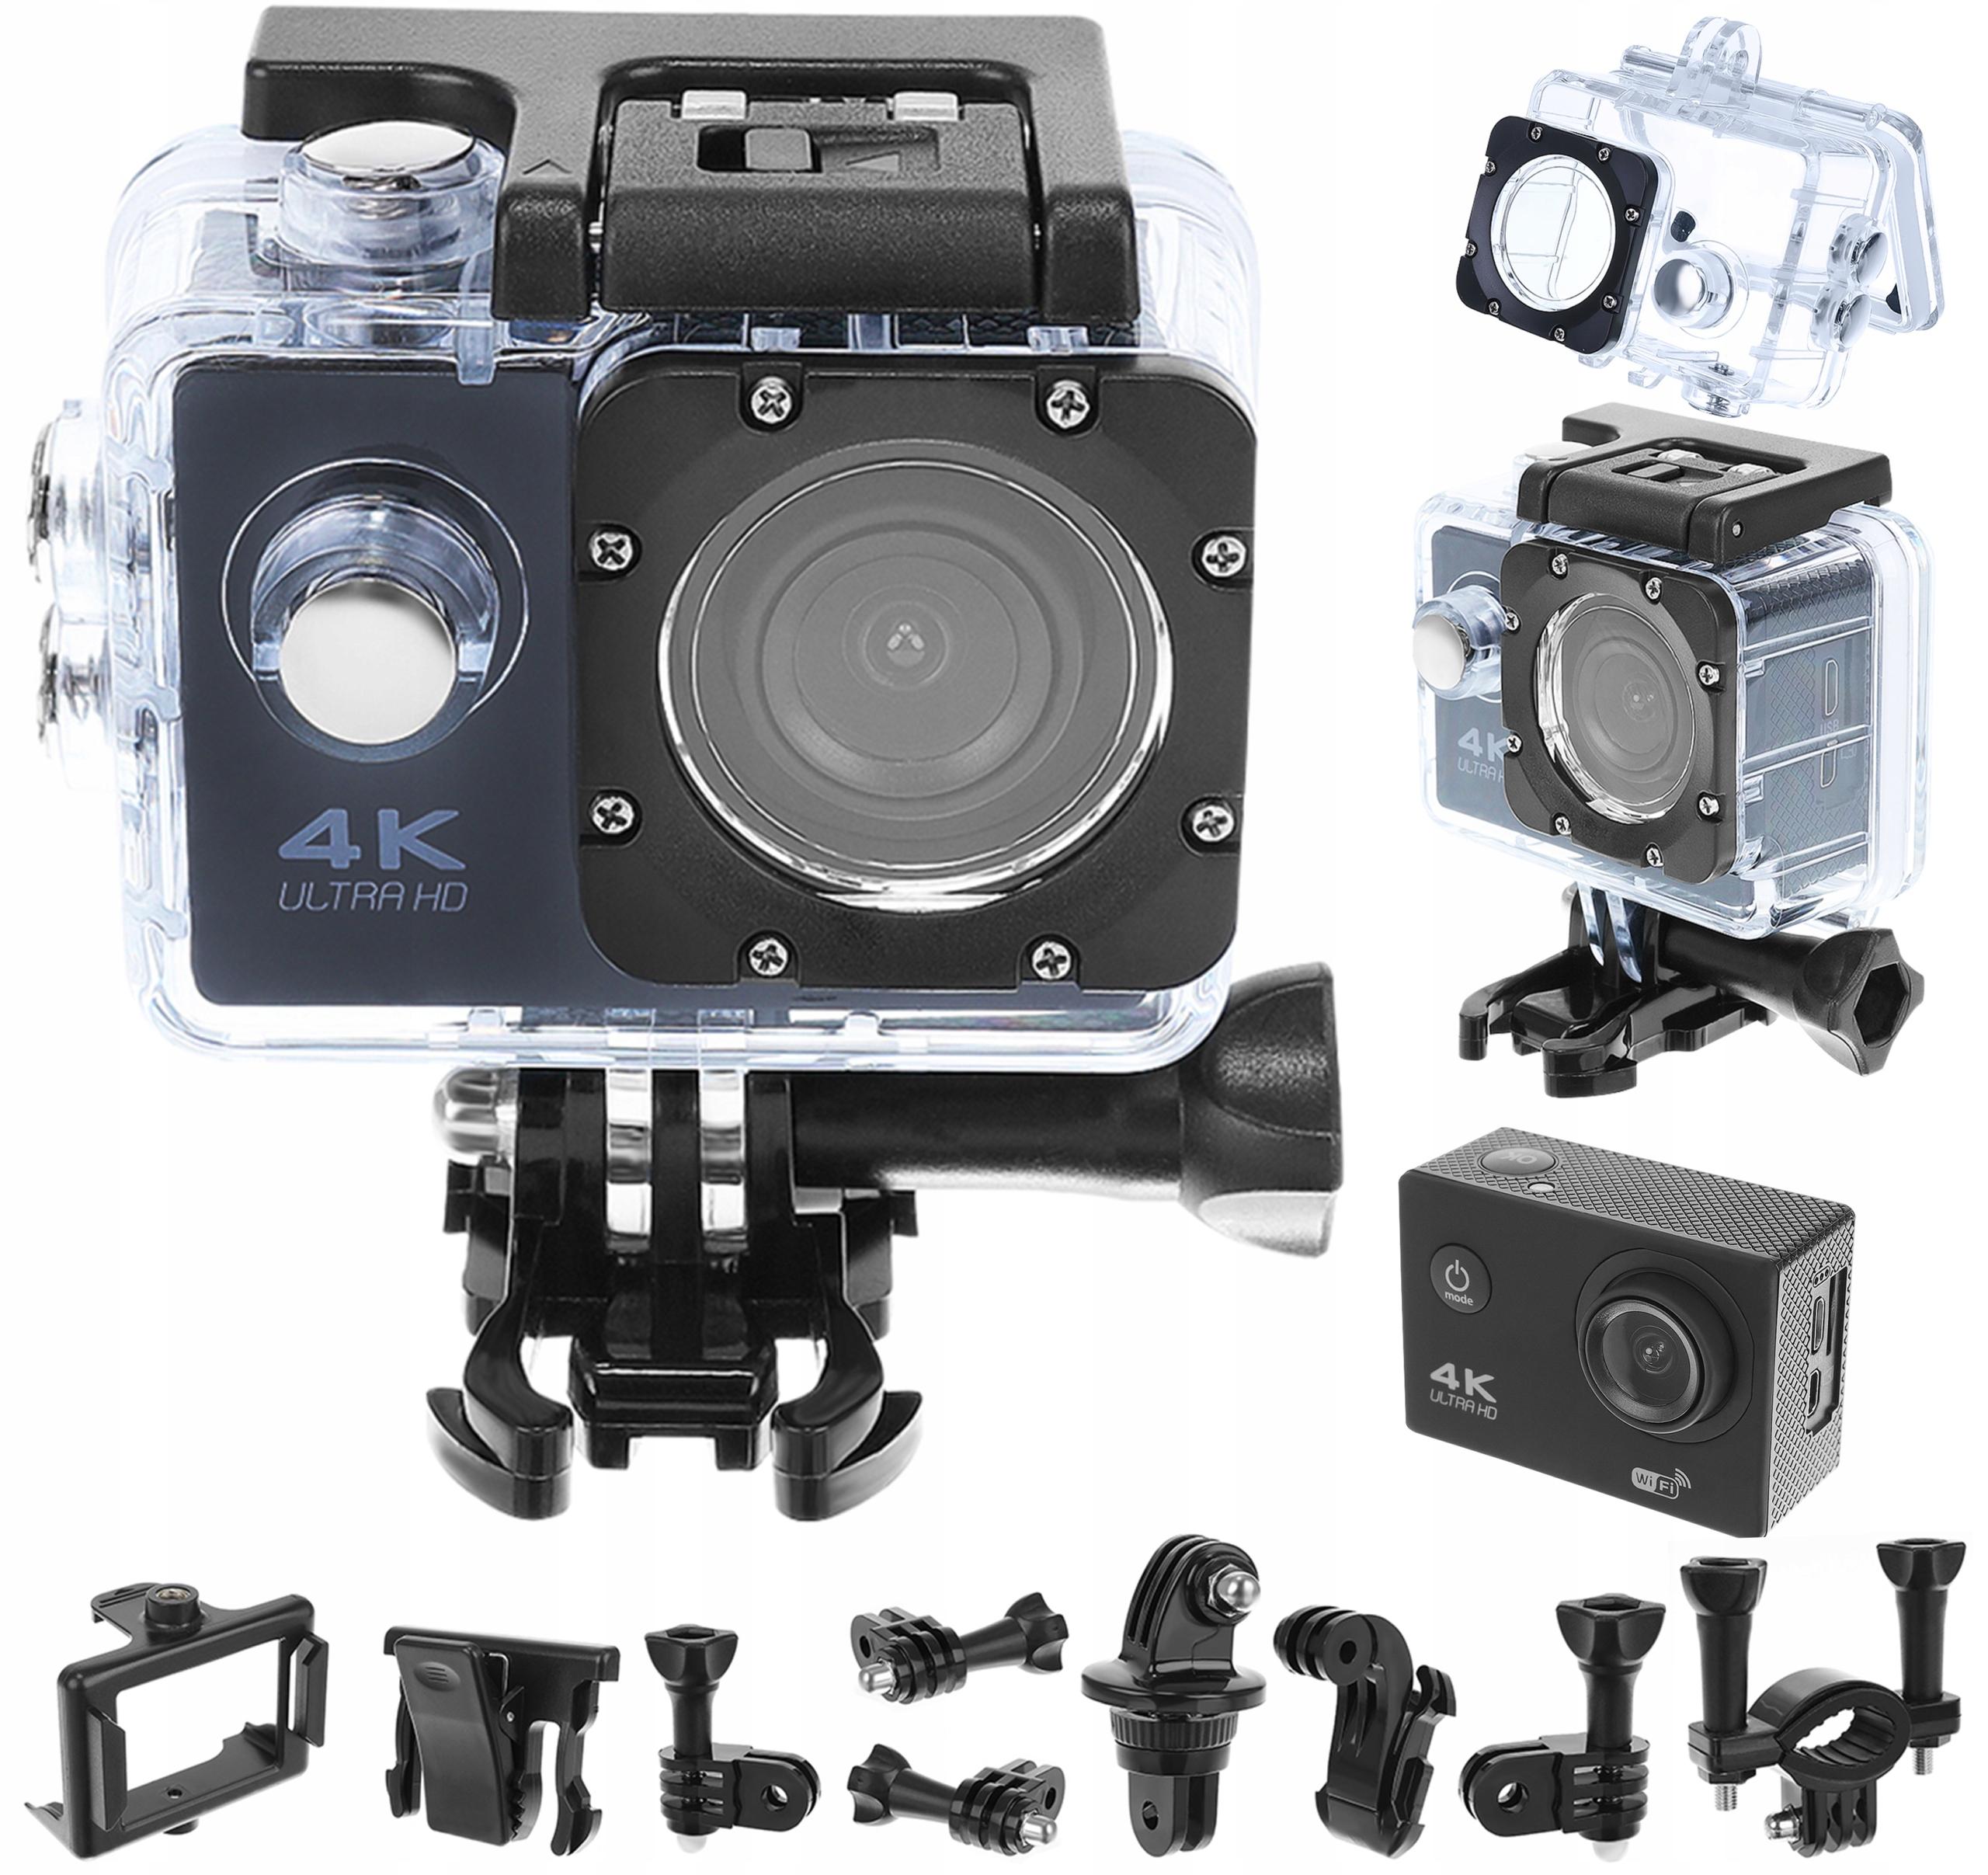 4K Спортивная камера Водонепроницаемая WiFi SD32GB Камера